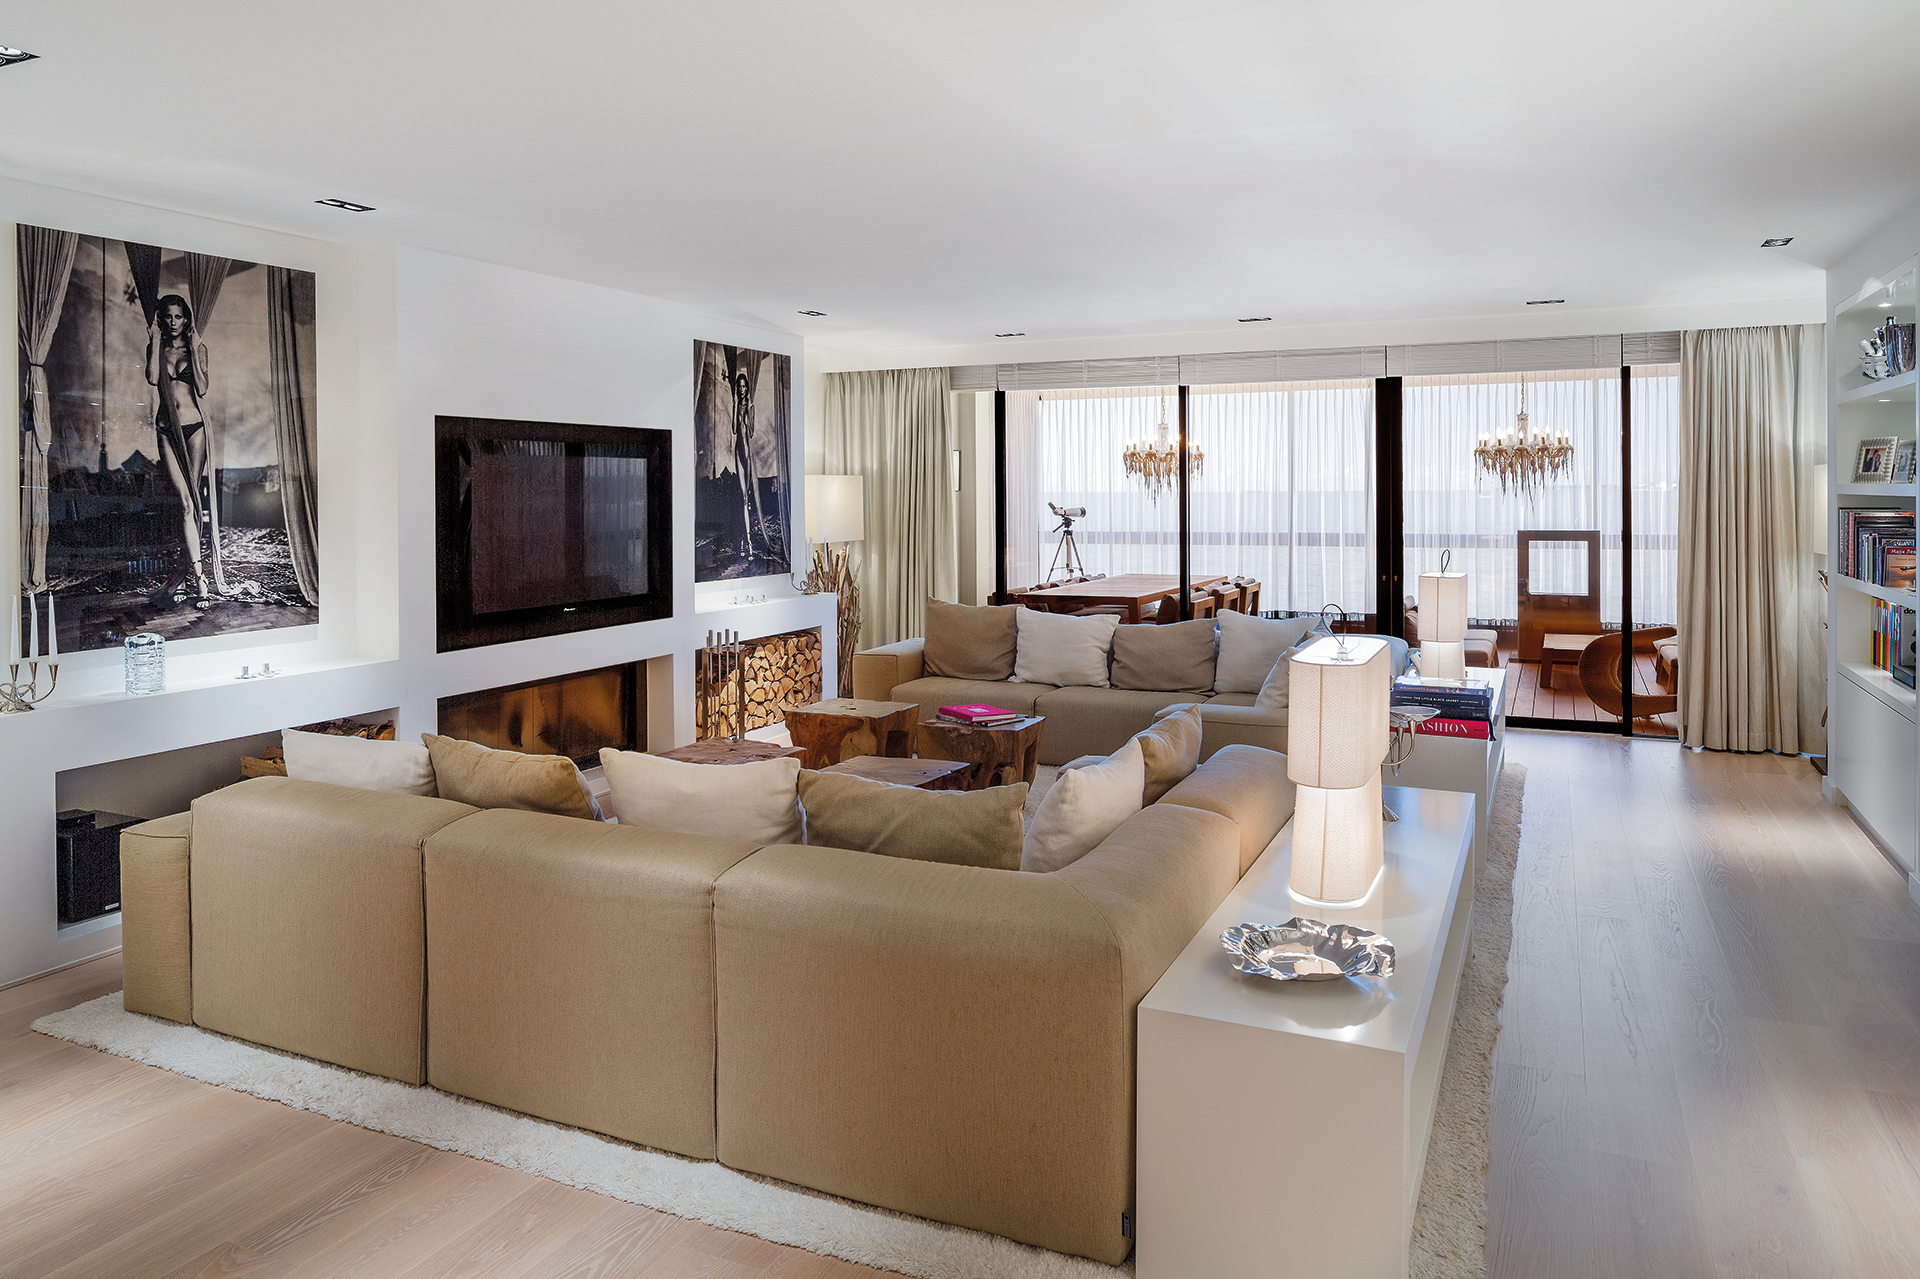 spacious livingroom with entertainment centre